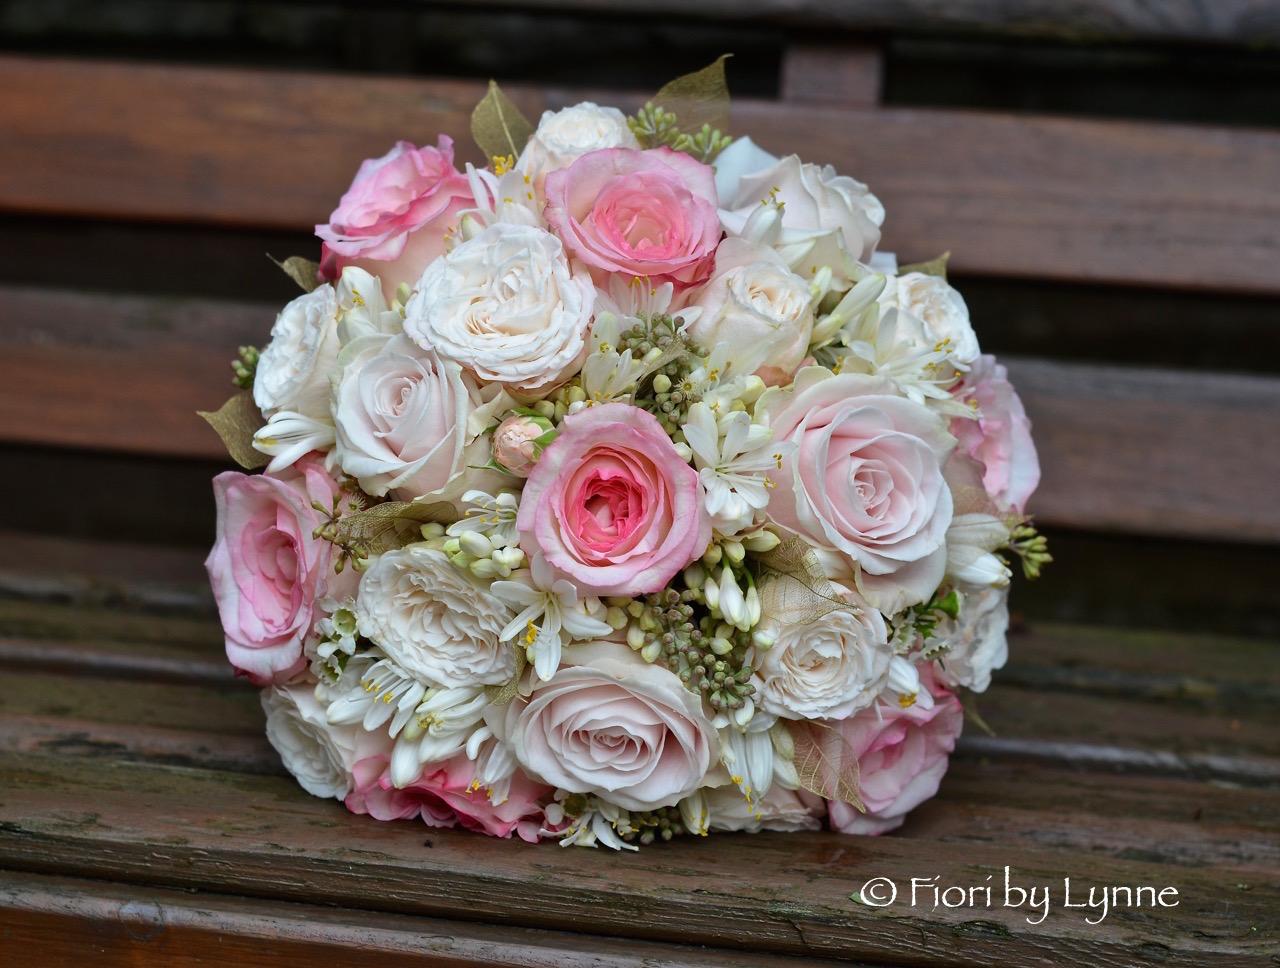 wedding flowers blog lucy 39 s vintage glamour wedding flowers rhinefield house. Black Bedroom Furniture Sets. Home Design Ideas